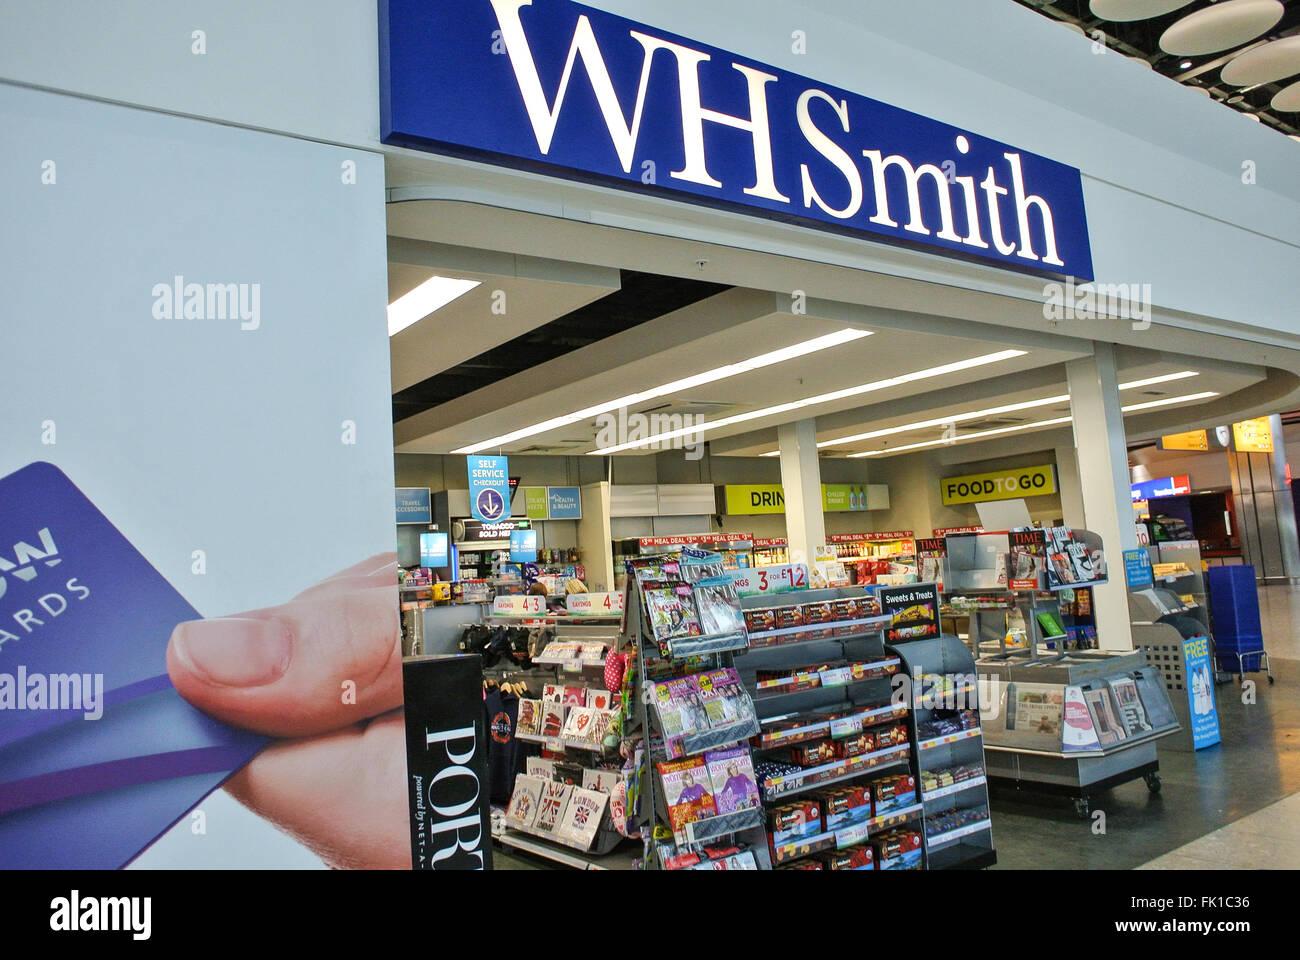 WH Smith store Heathrow London - Stock Image